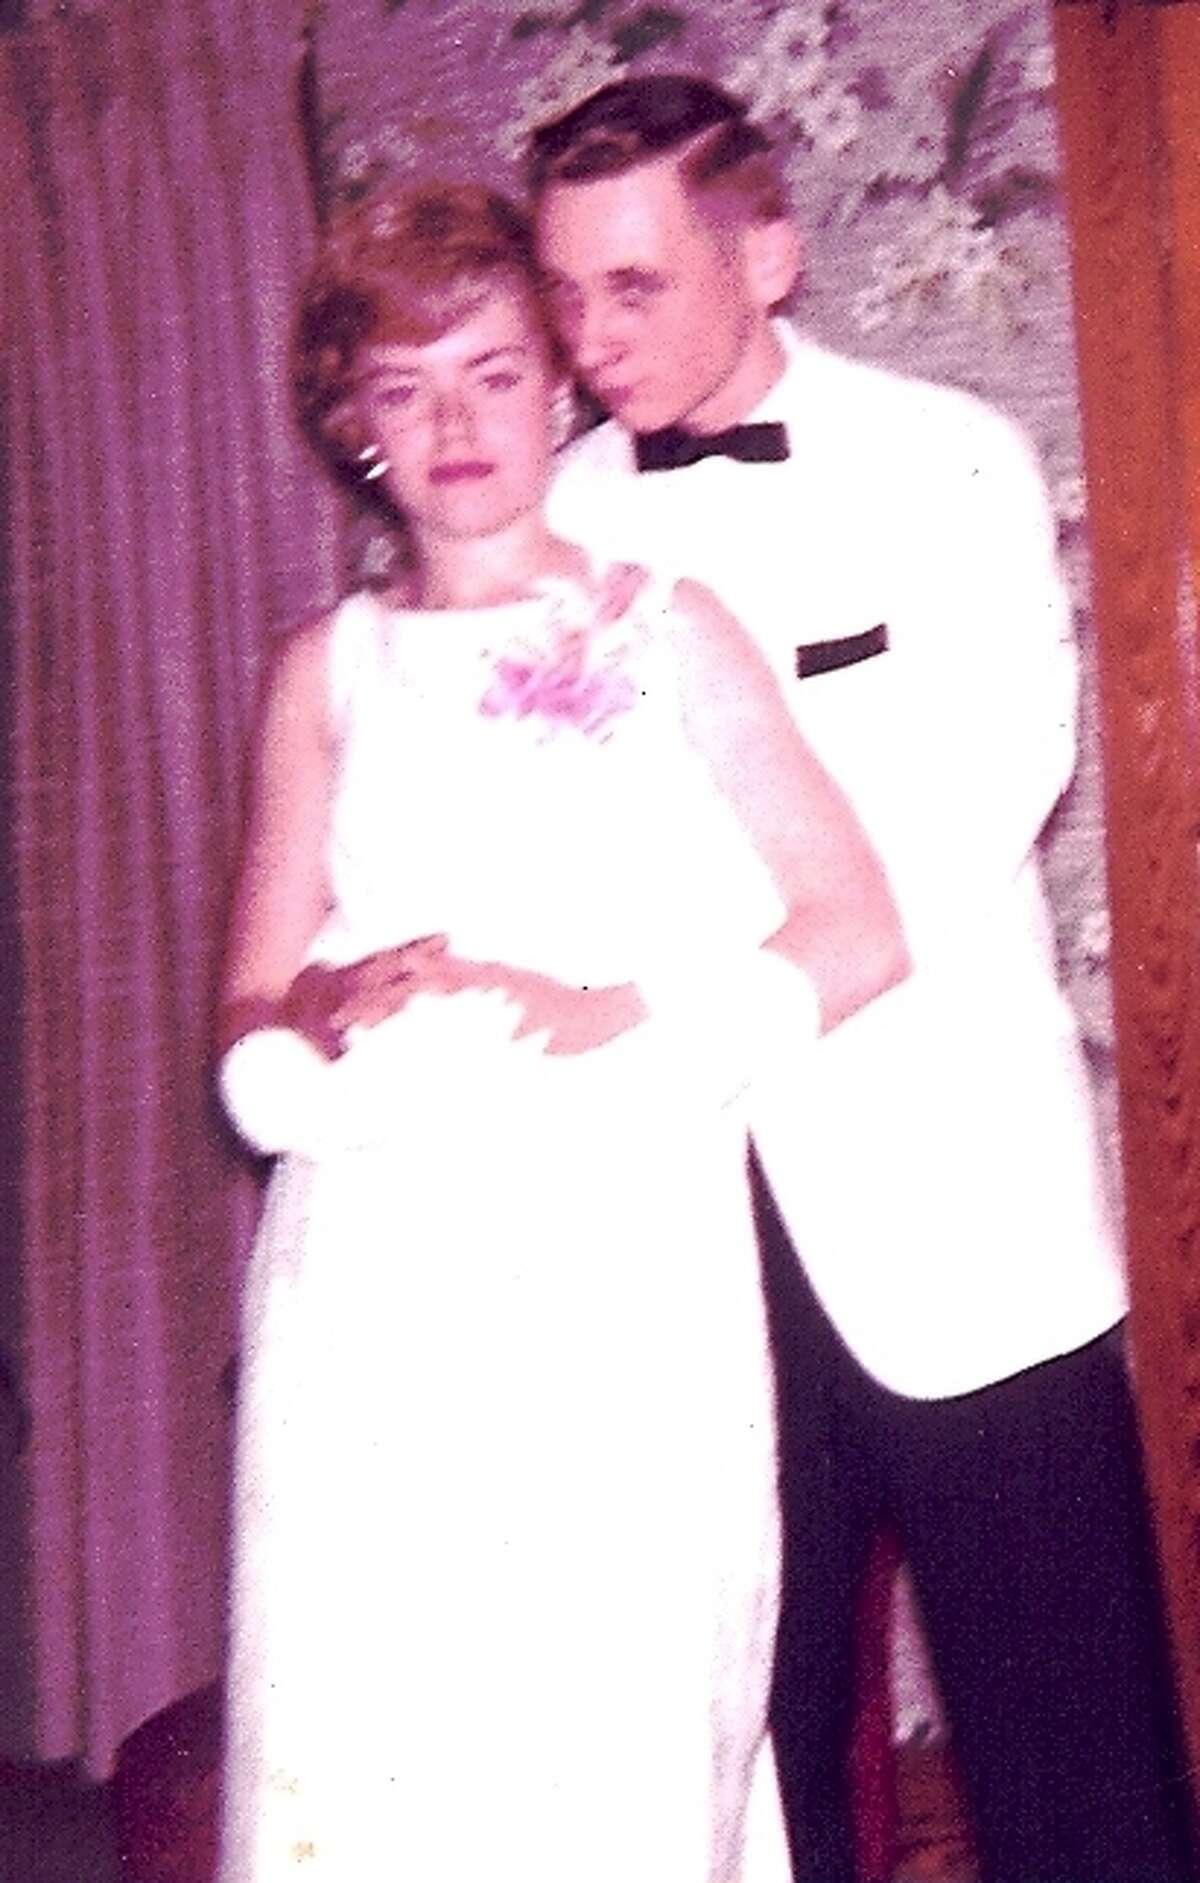 Jeanne Bright and Dennis Majeski at Thomas Jefferson High School in Council Bluff, Iowa, in 1964.